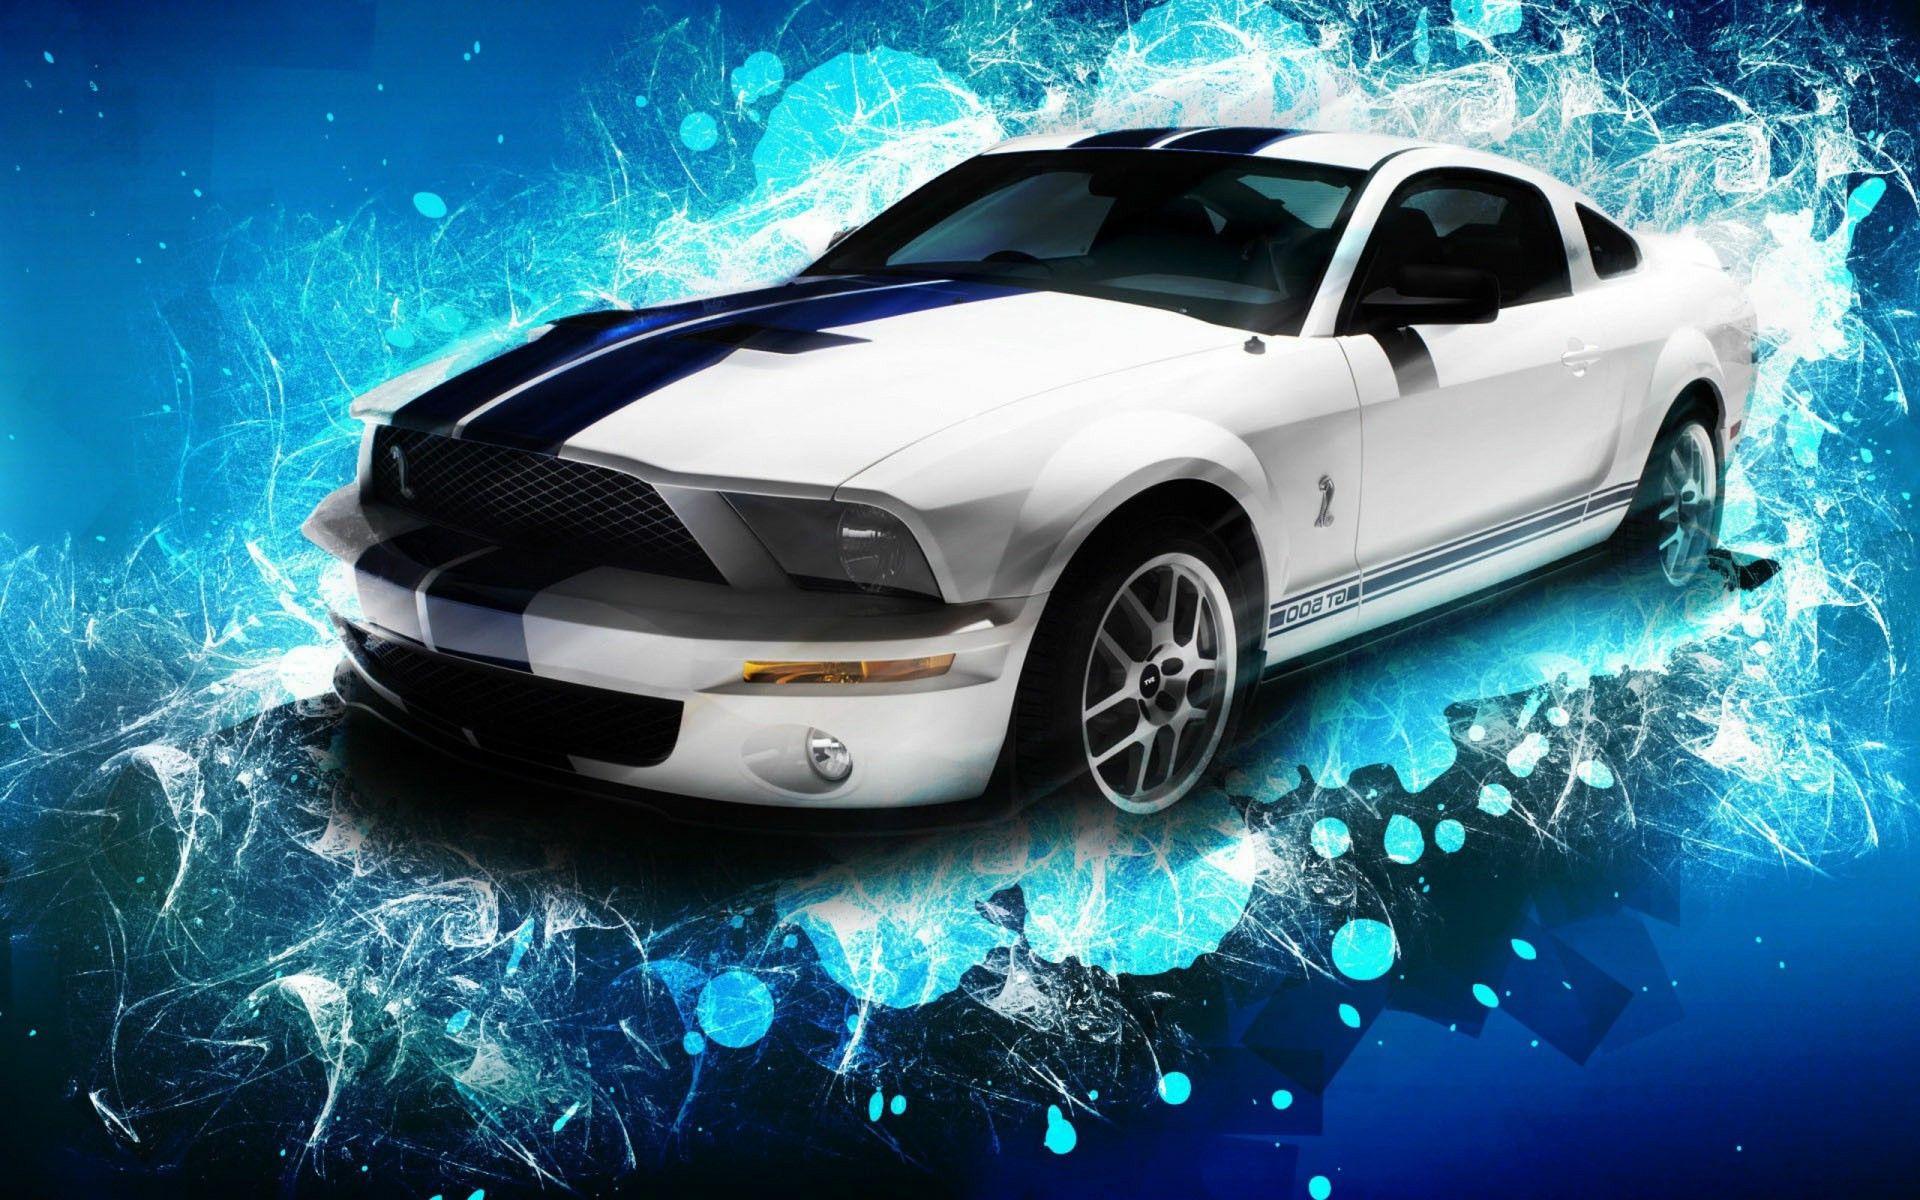 Amazing Graphic Design Background D Car HD Wallpapers 1600×900 3d Car  Wallpapers (46 Wallpapers)   Adorable Wallpapers